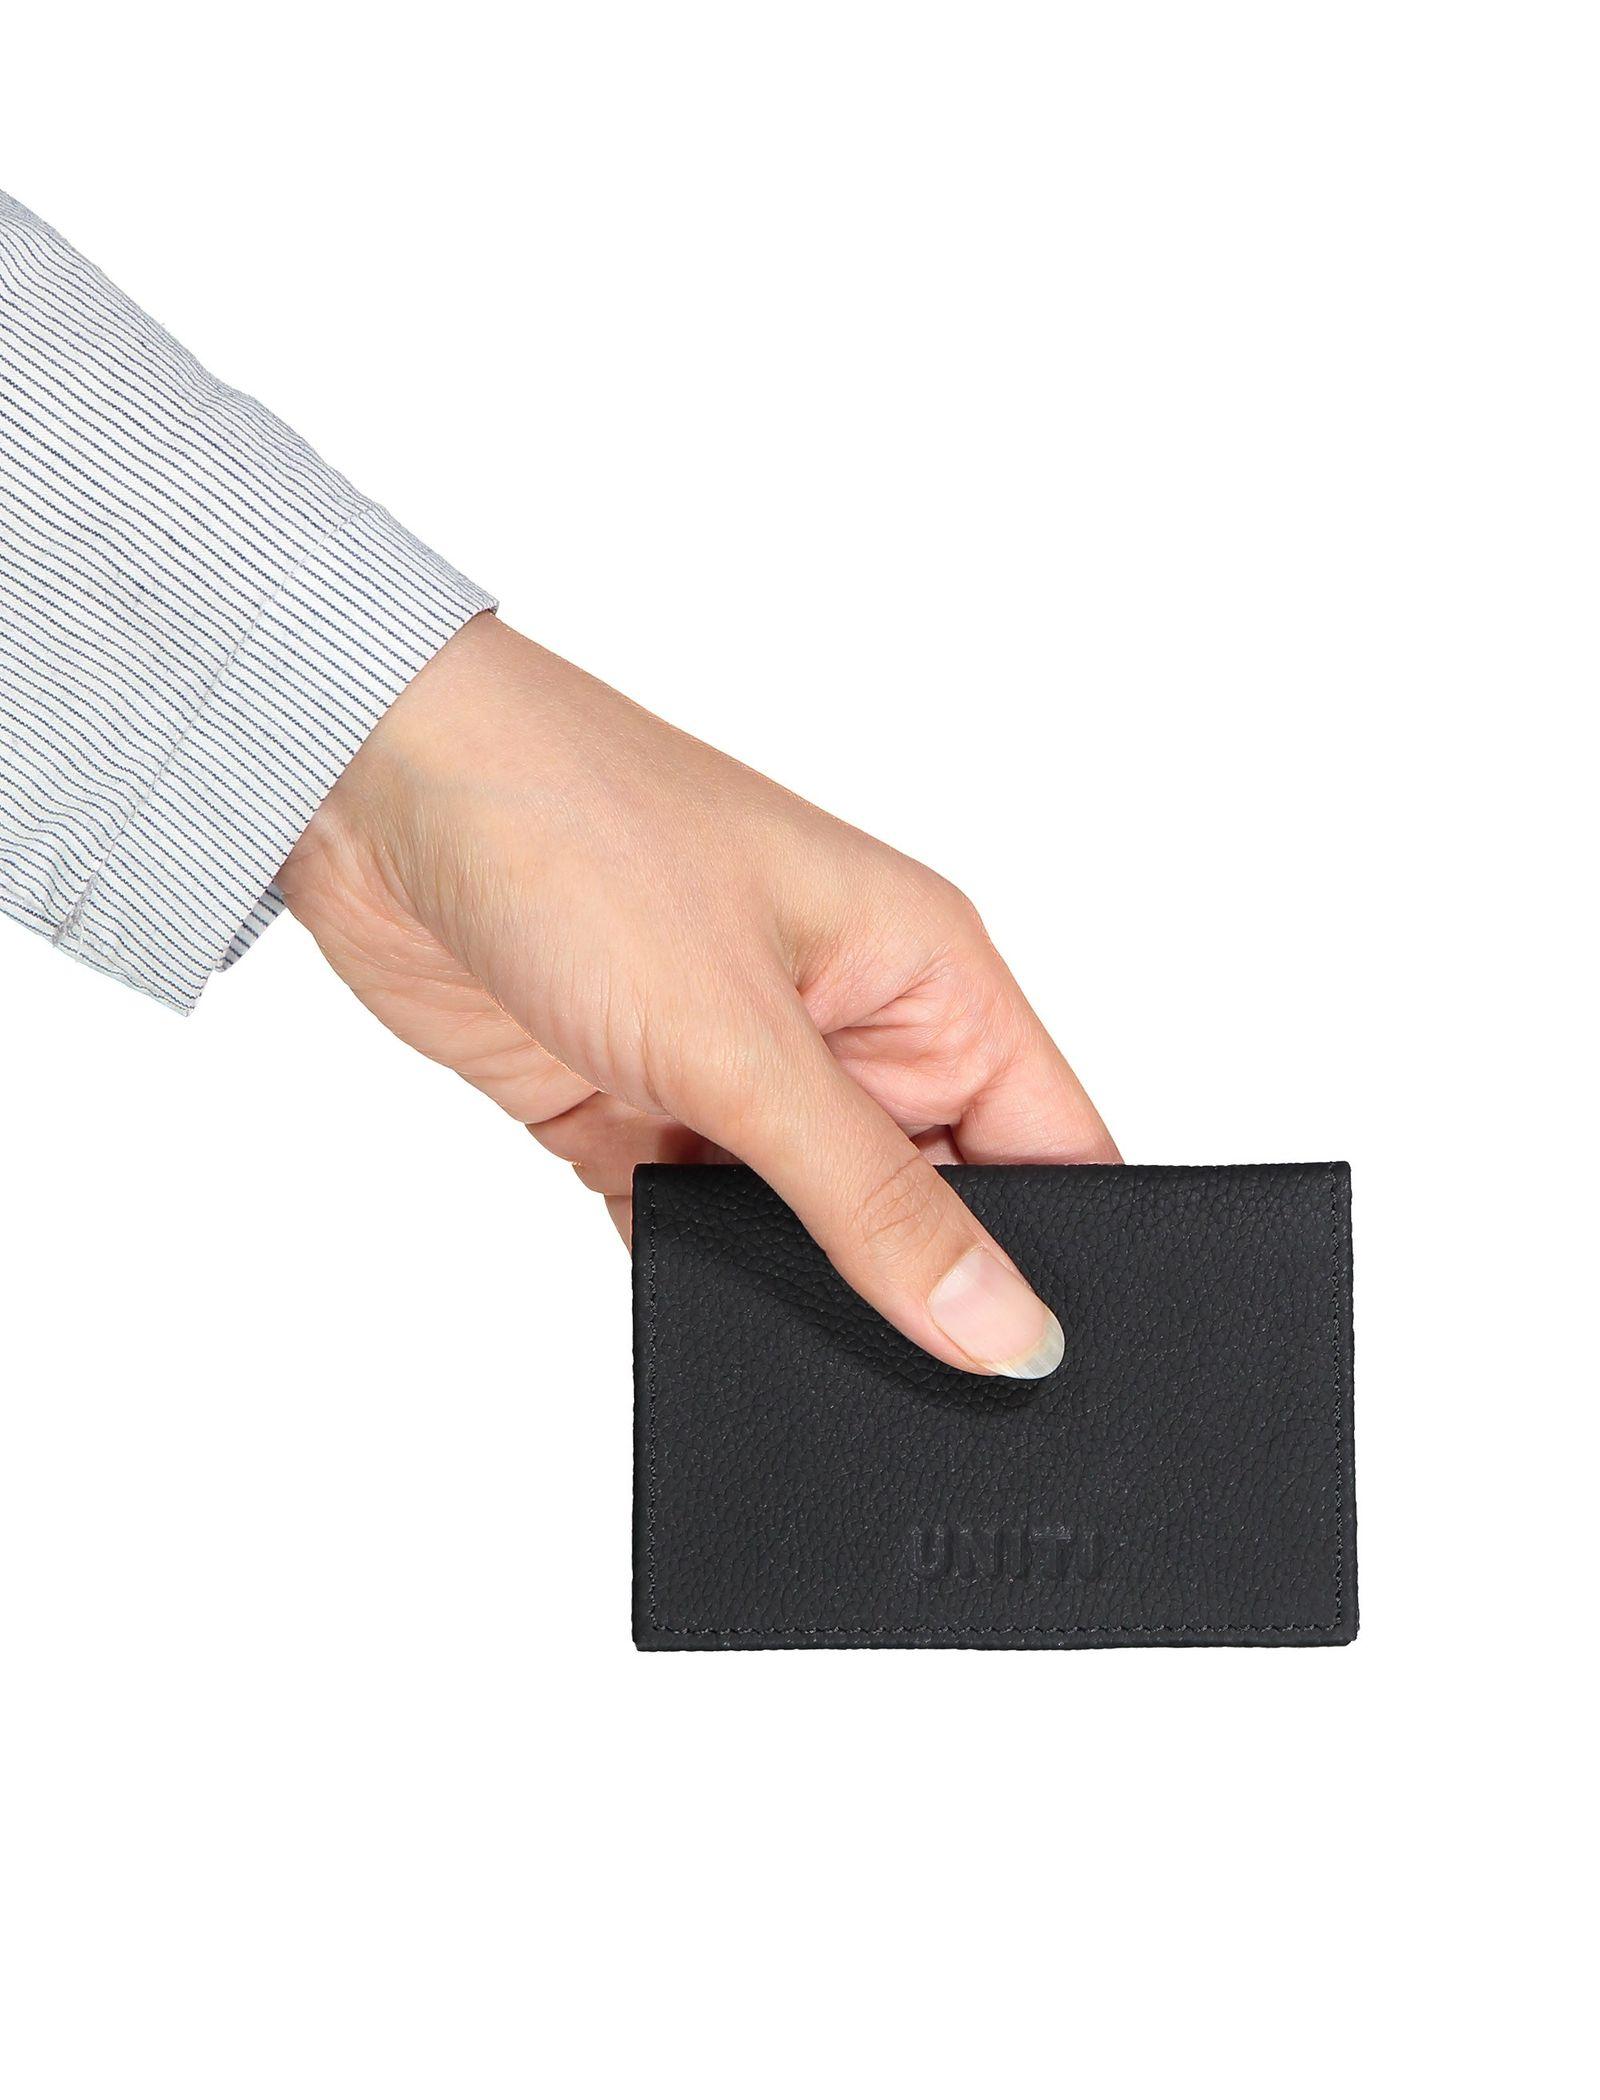 کیف کارت بزرگسال - یونیتی - مشکي - 5